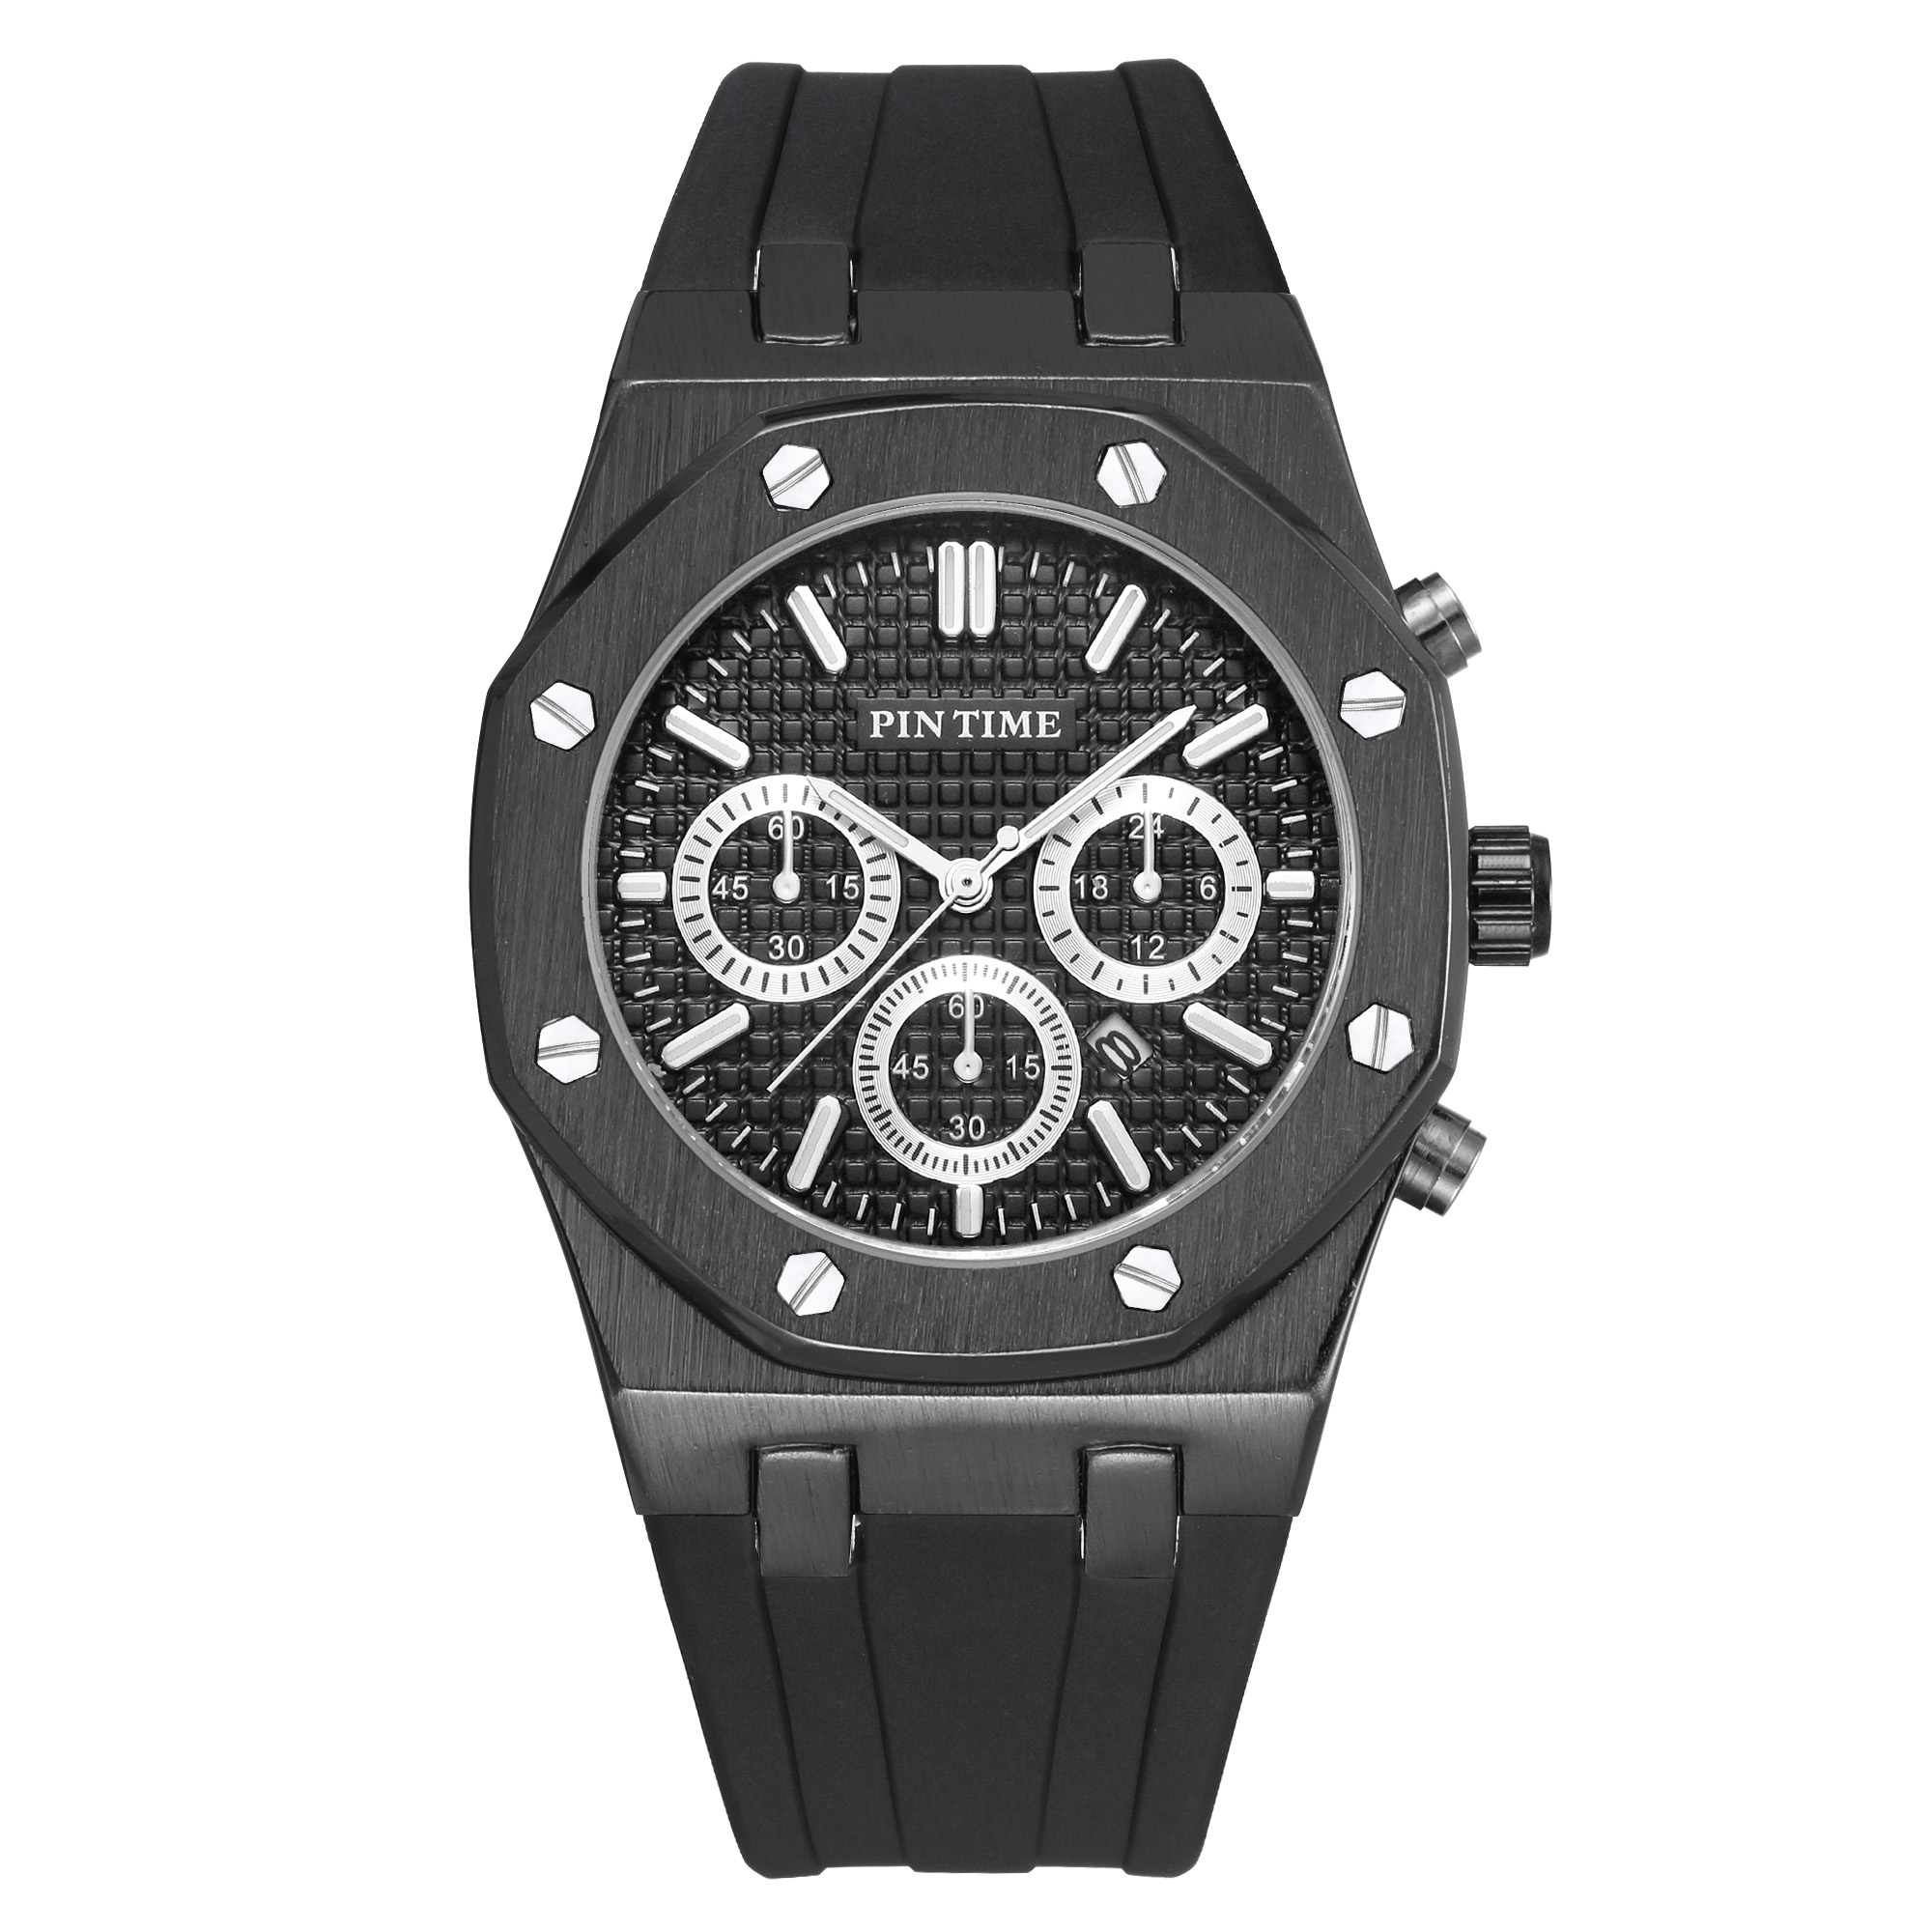 PINTIME Mens Watches Top Brand Luxury Men Military Sport Wristwatch Rubber Quartz Watch Waterproof Erkek Saat Relogio Masculino